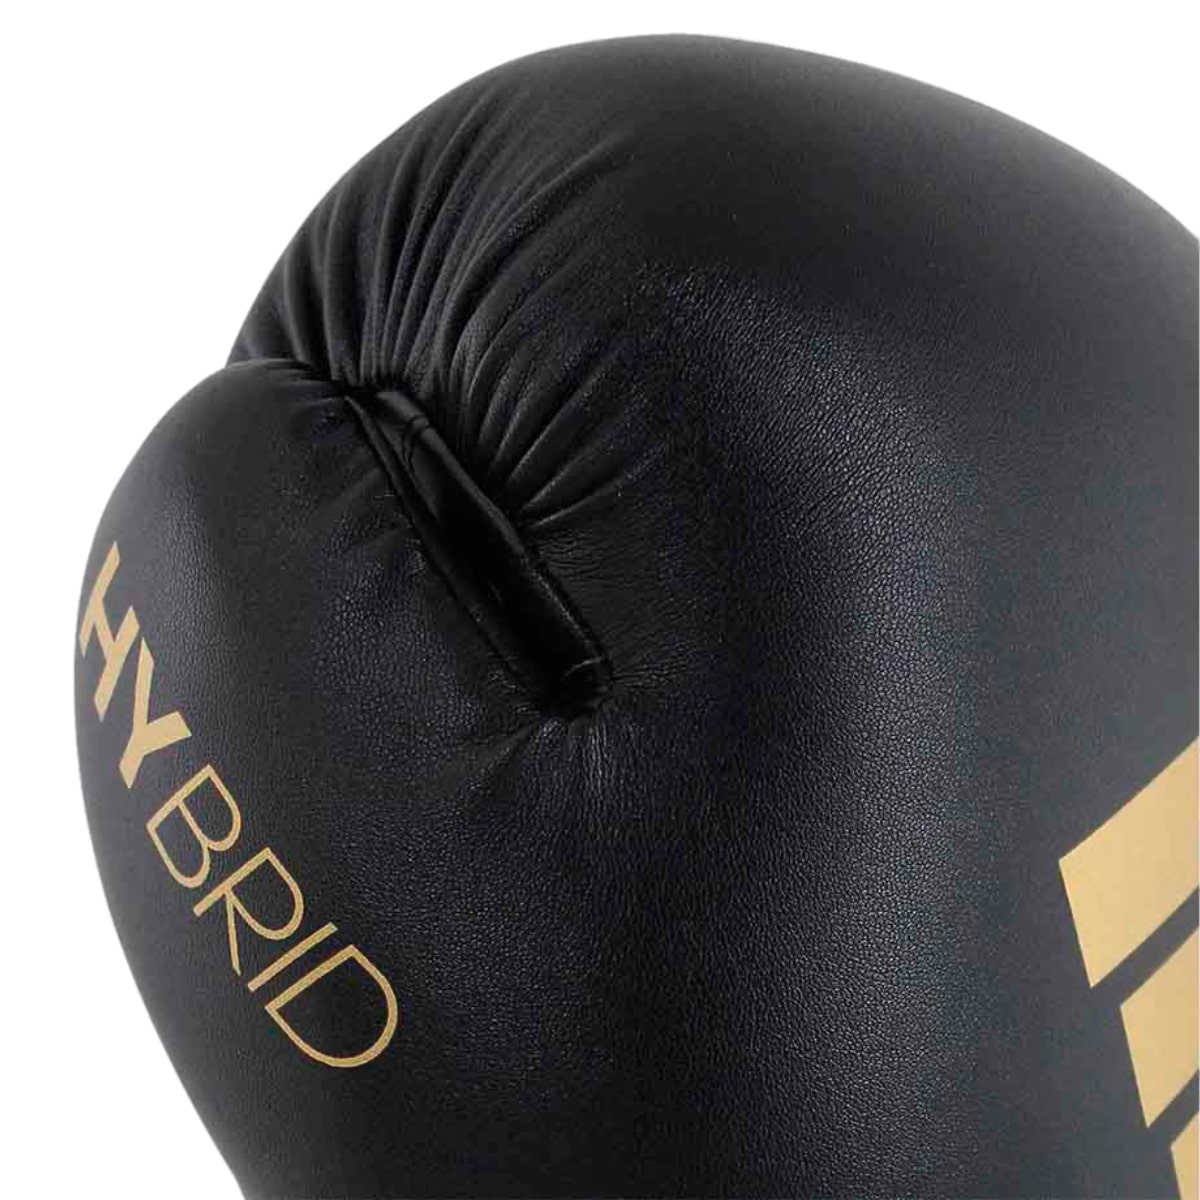 Luva Boxe Adidas Hybrid 100 - Dourada